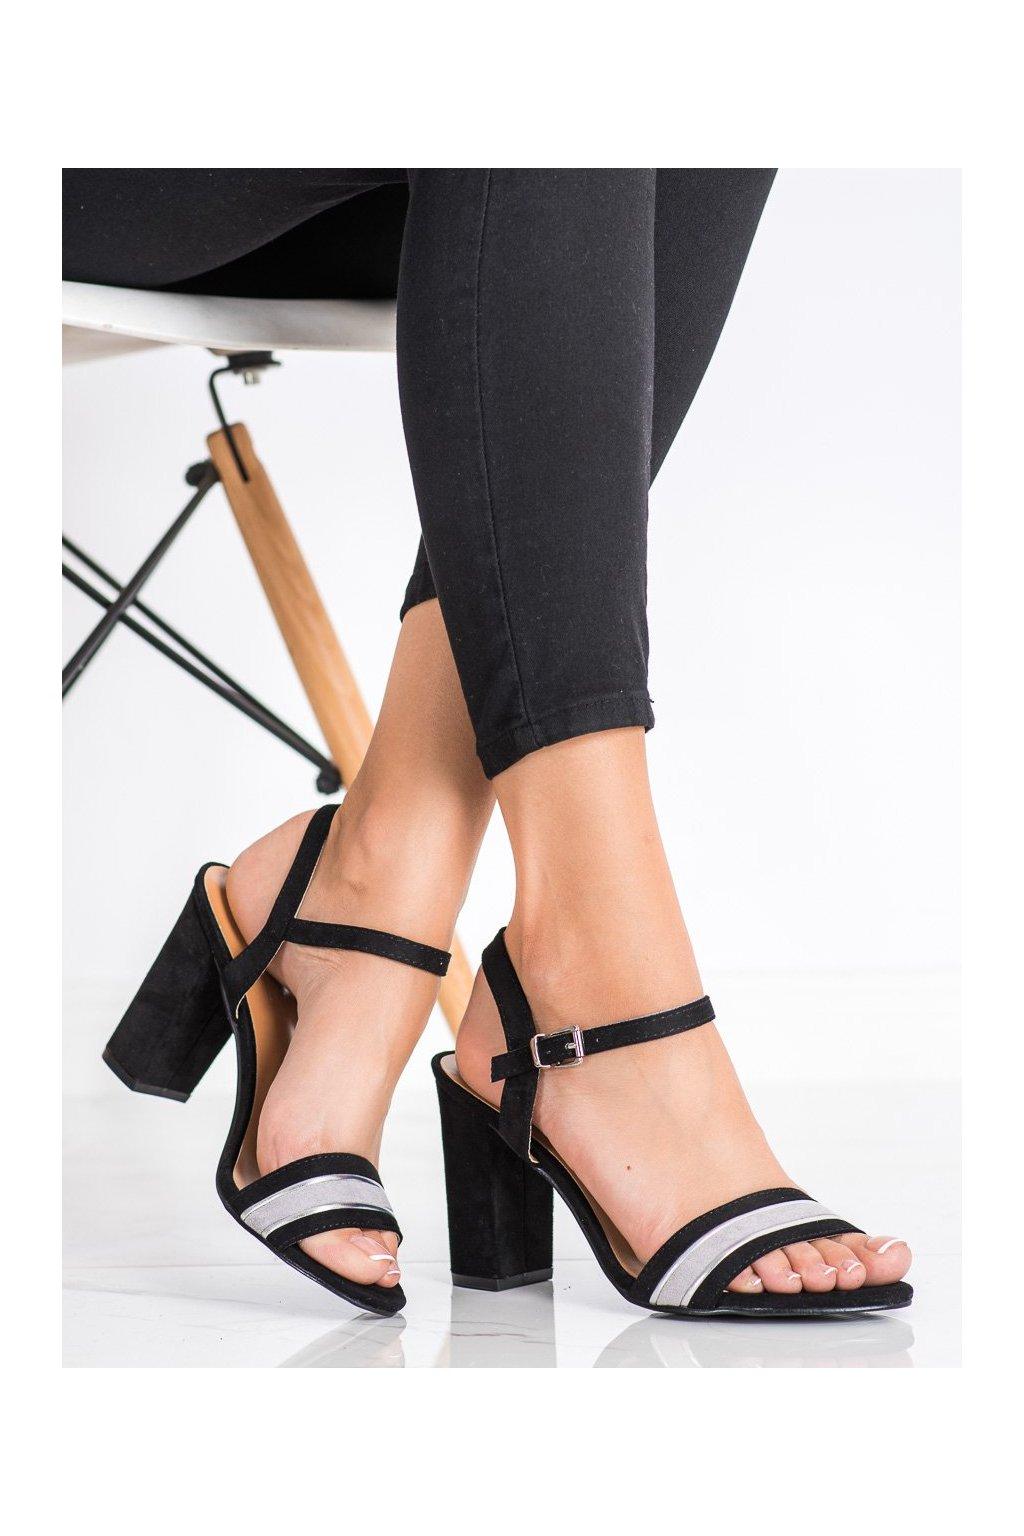 Čierne dámske sandále Cm paris kod 3587B